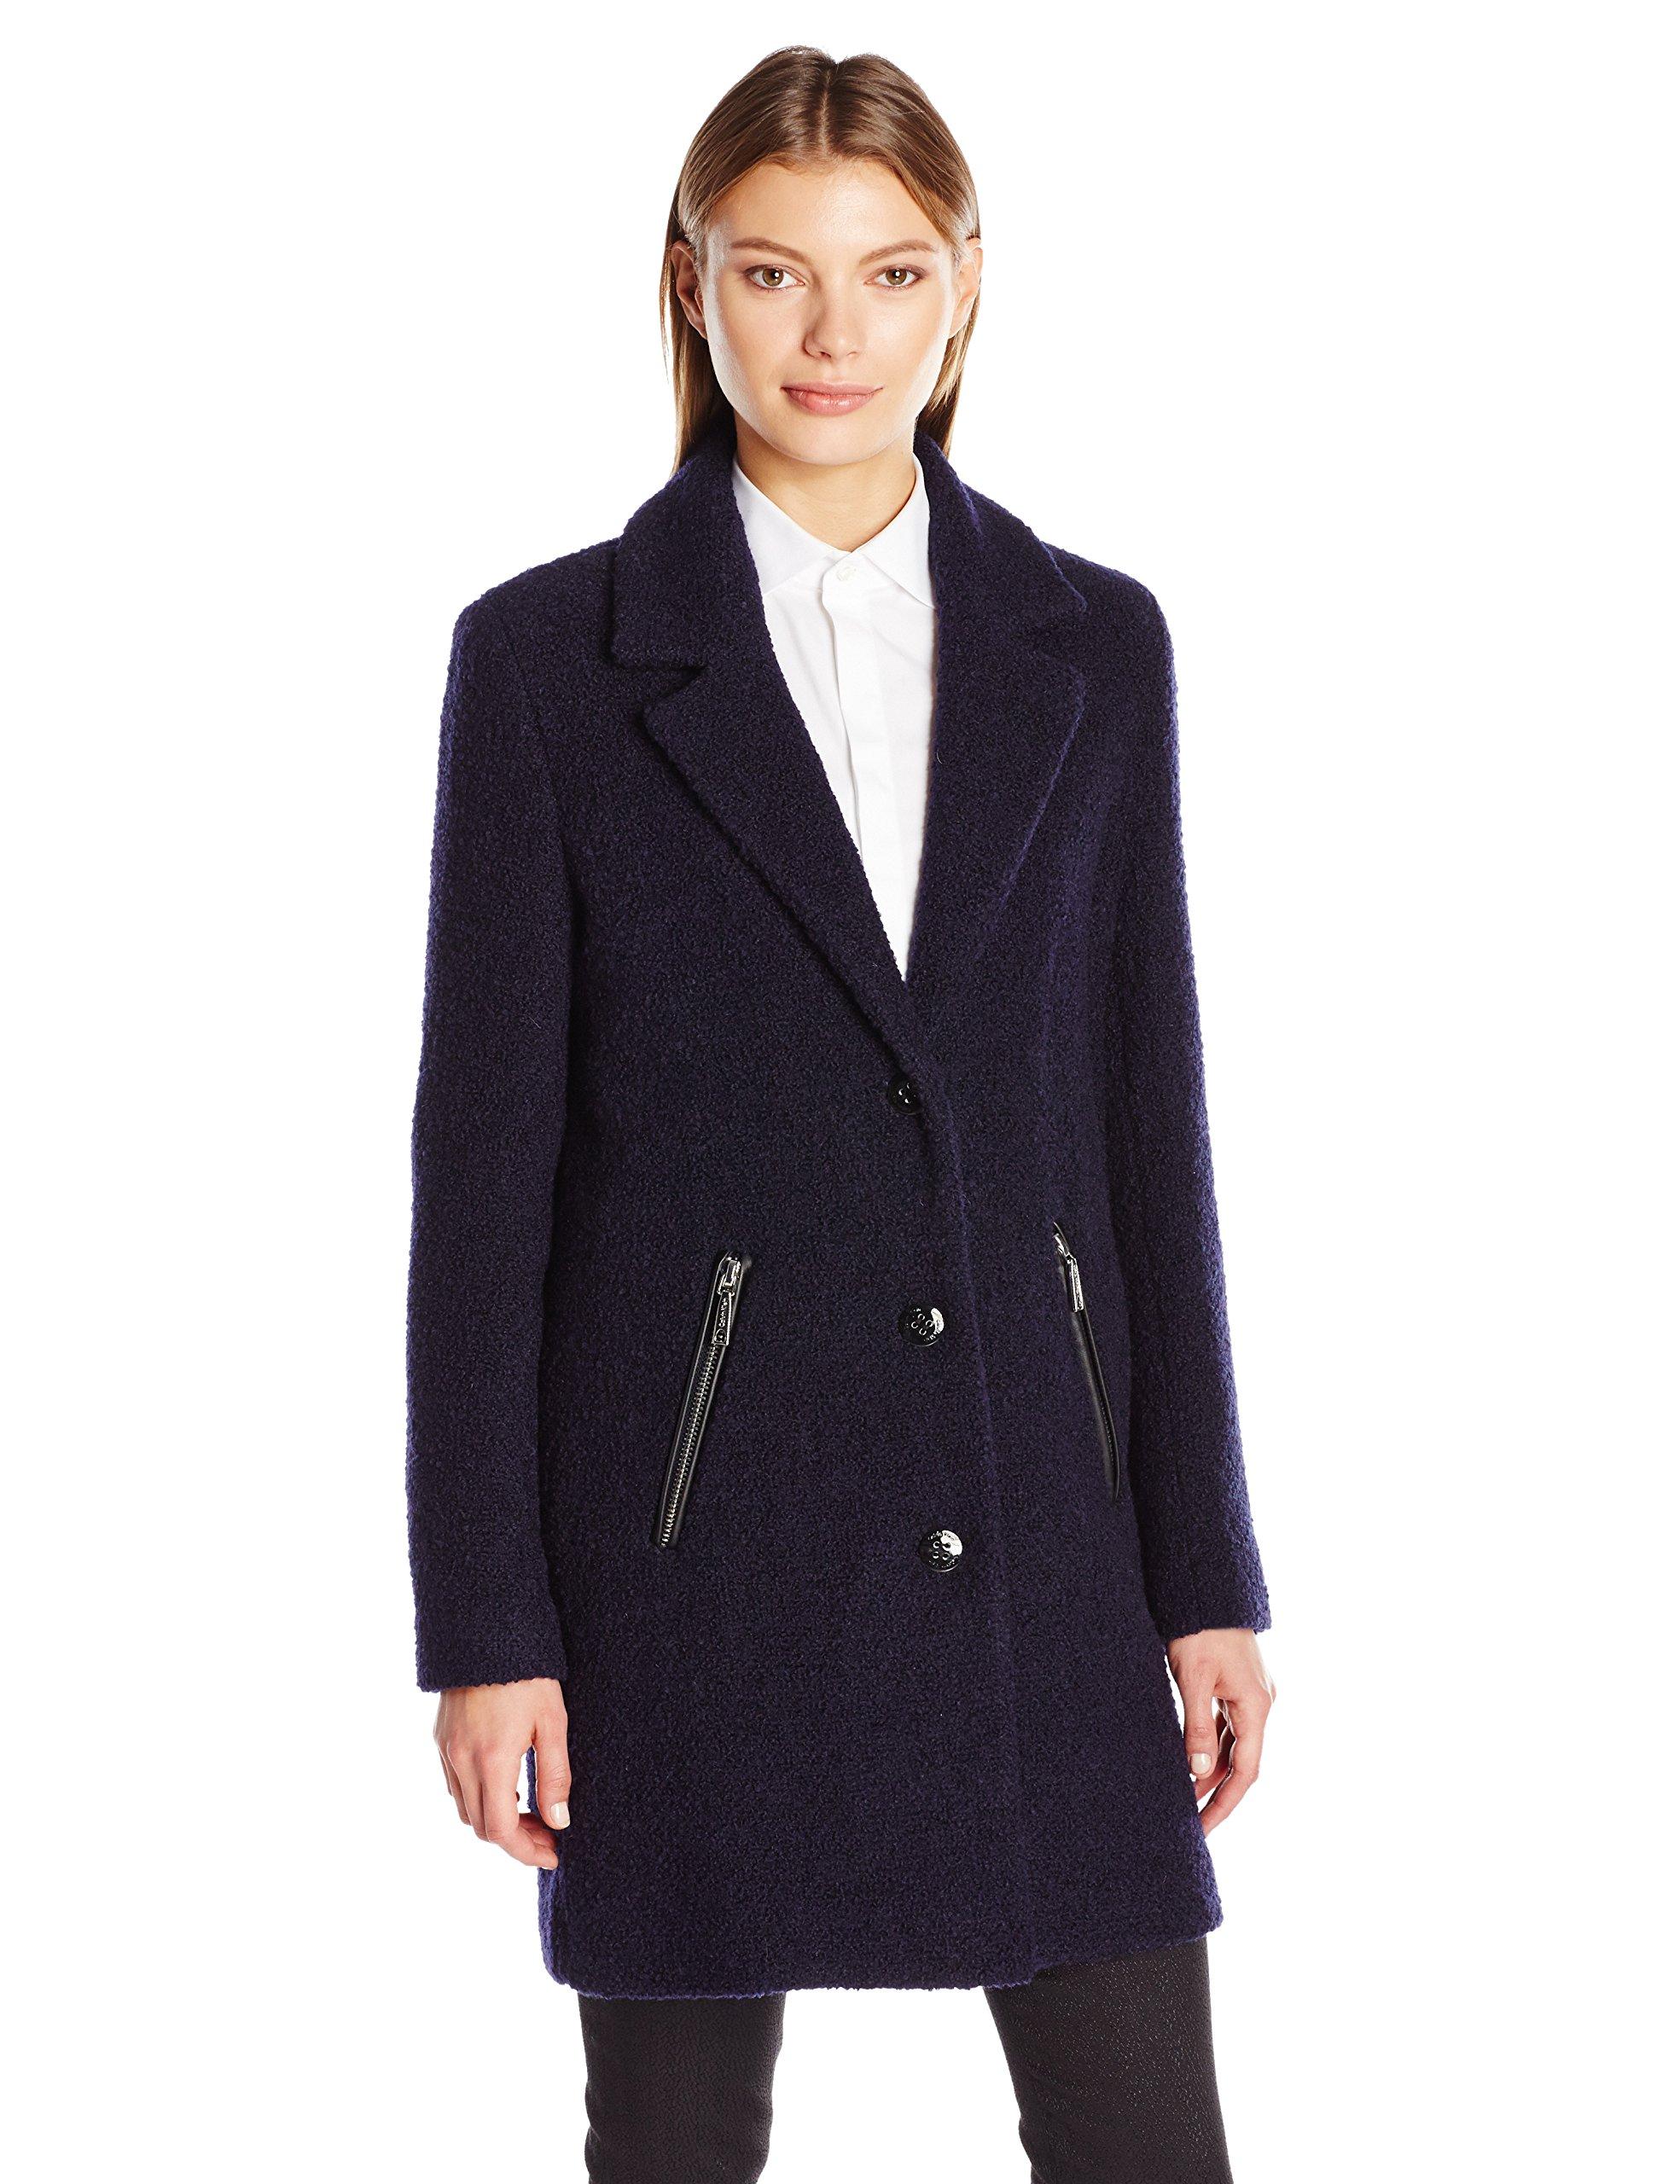 Calvin Klein Women's Boucle 3 Wool Coat with Button Closure, Indigo, M